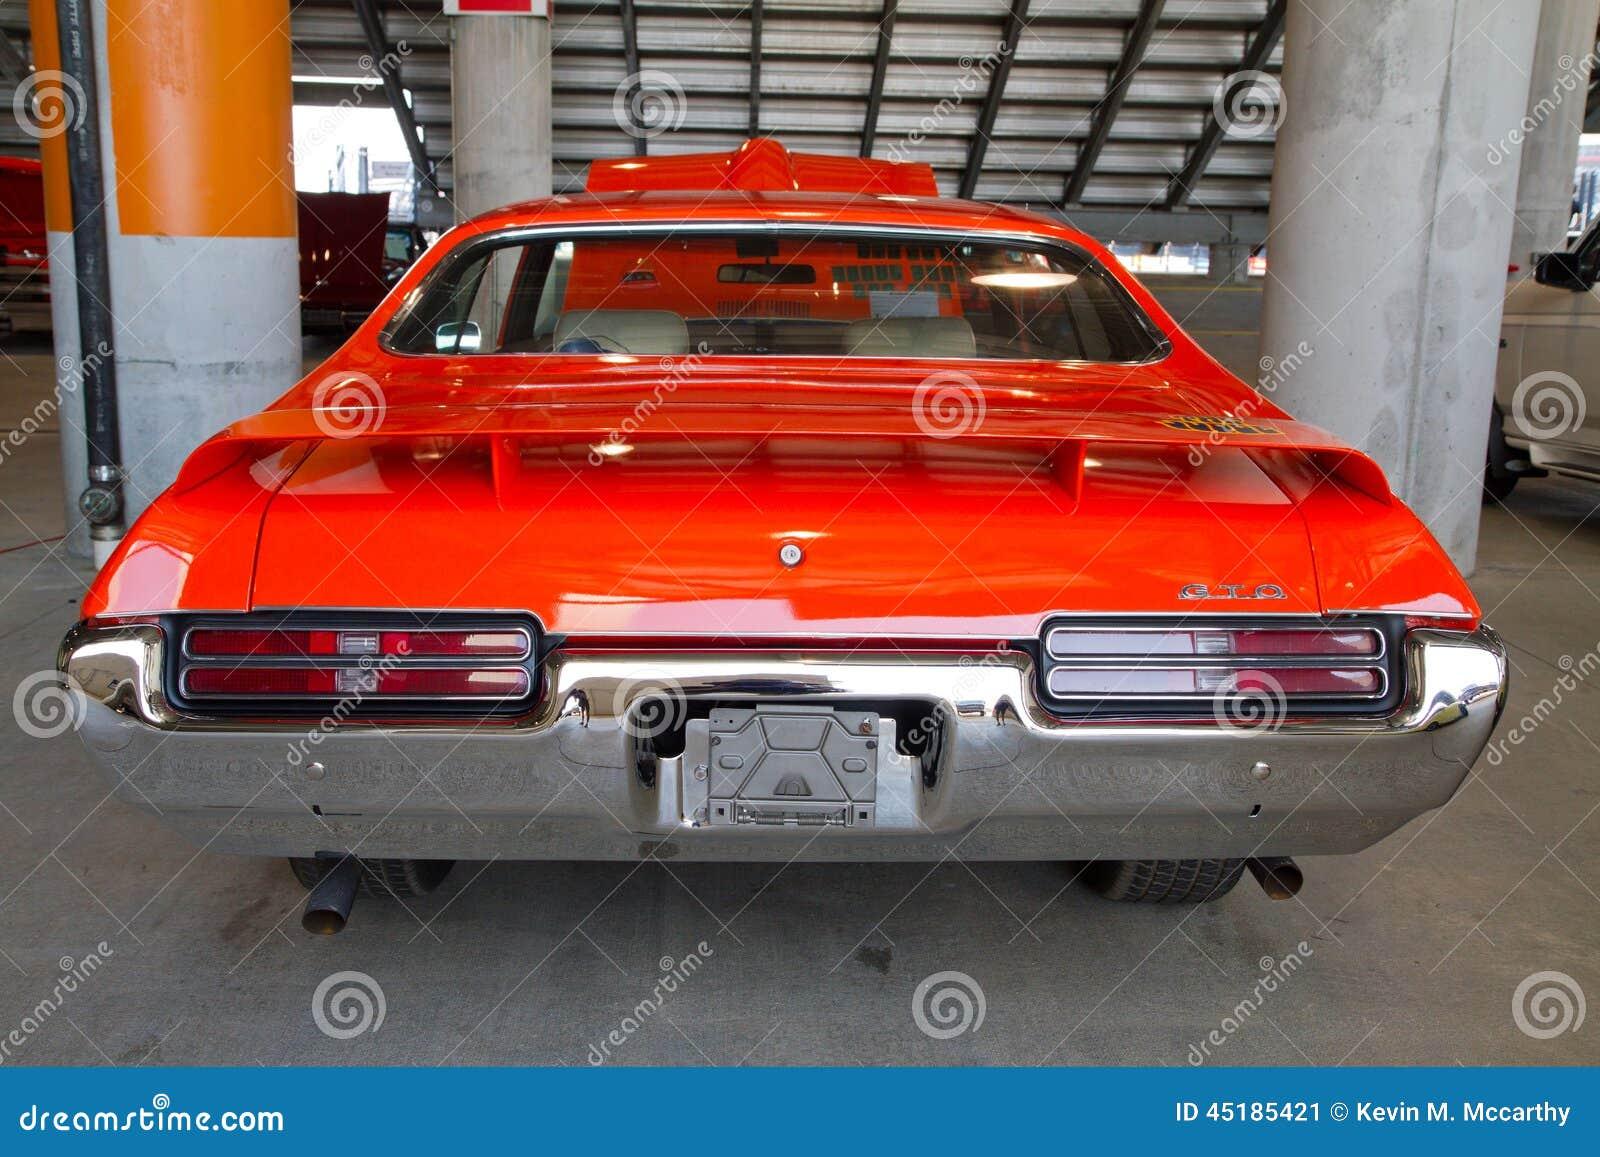 Pontiac Gto 2014 >> Classic 1969 Pontiac Gto Automobile Editorial Photo Image Of